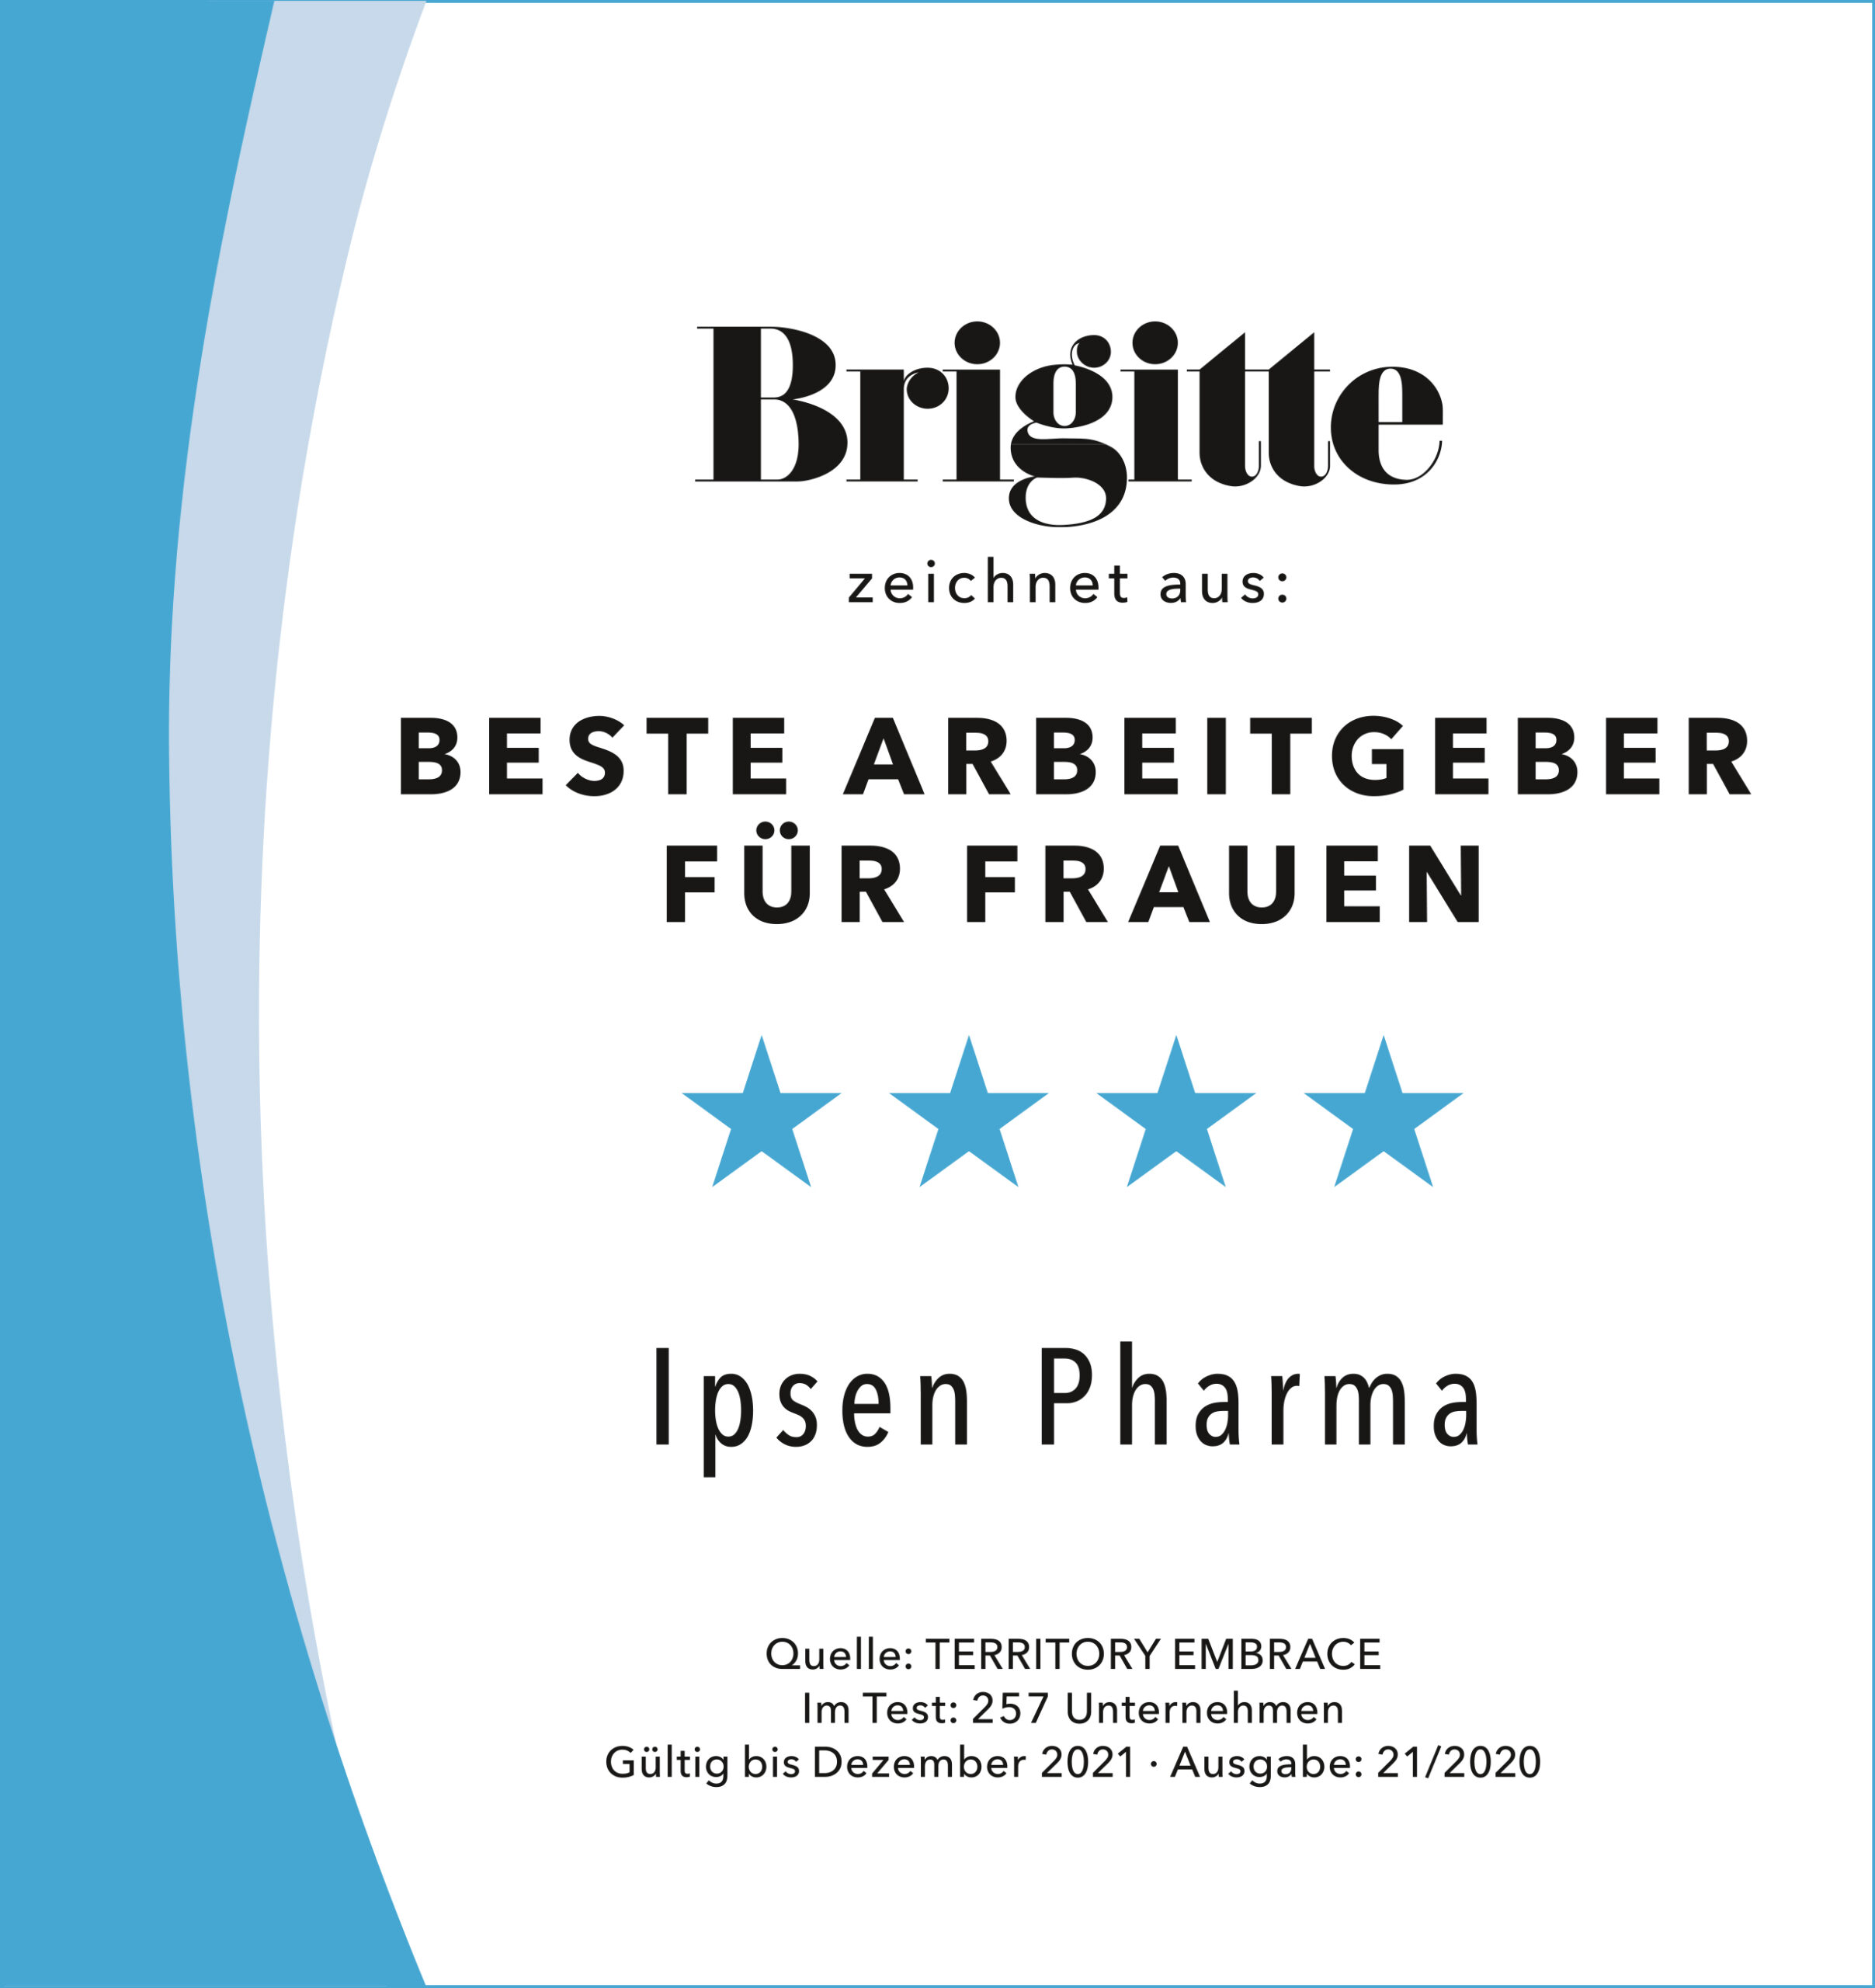 BRI_2120_Ipsen_Pharma